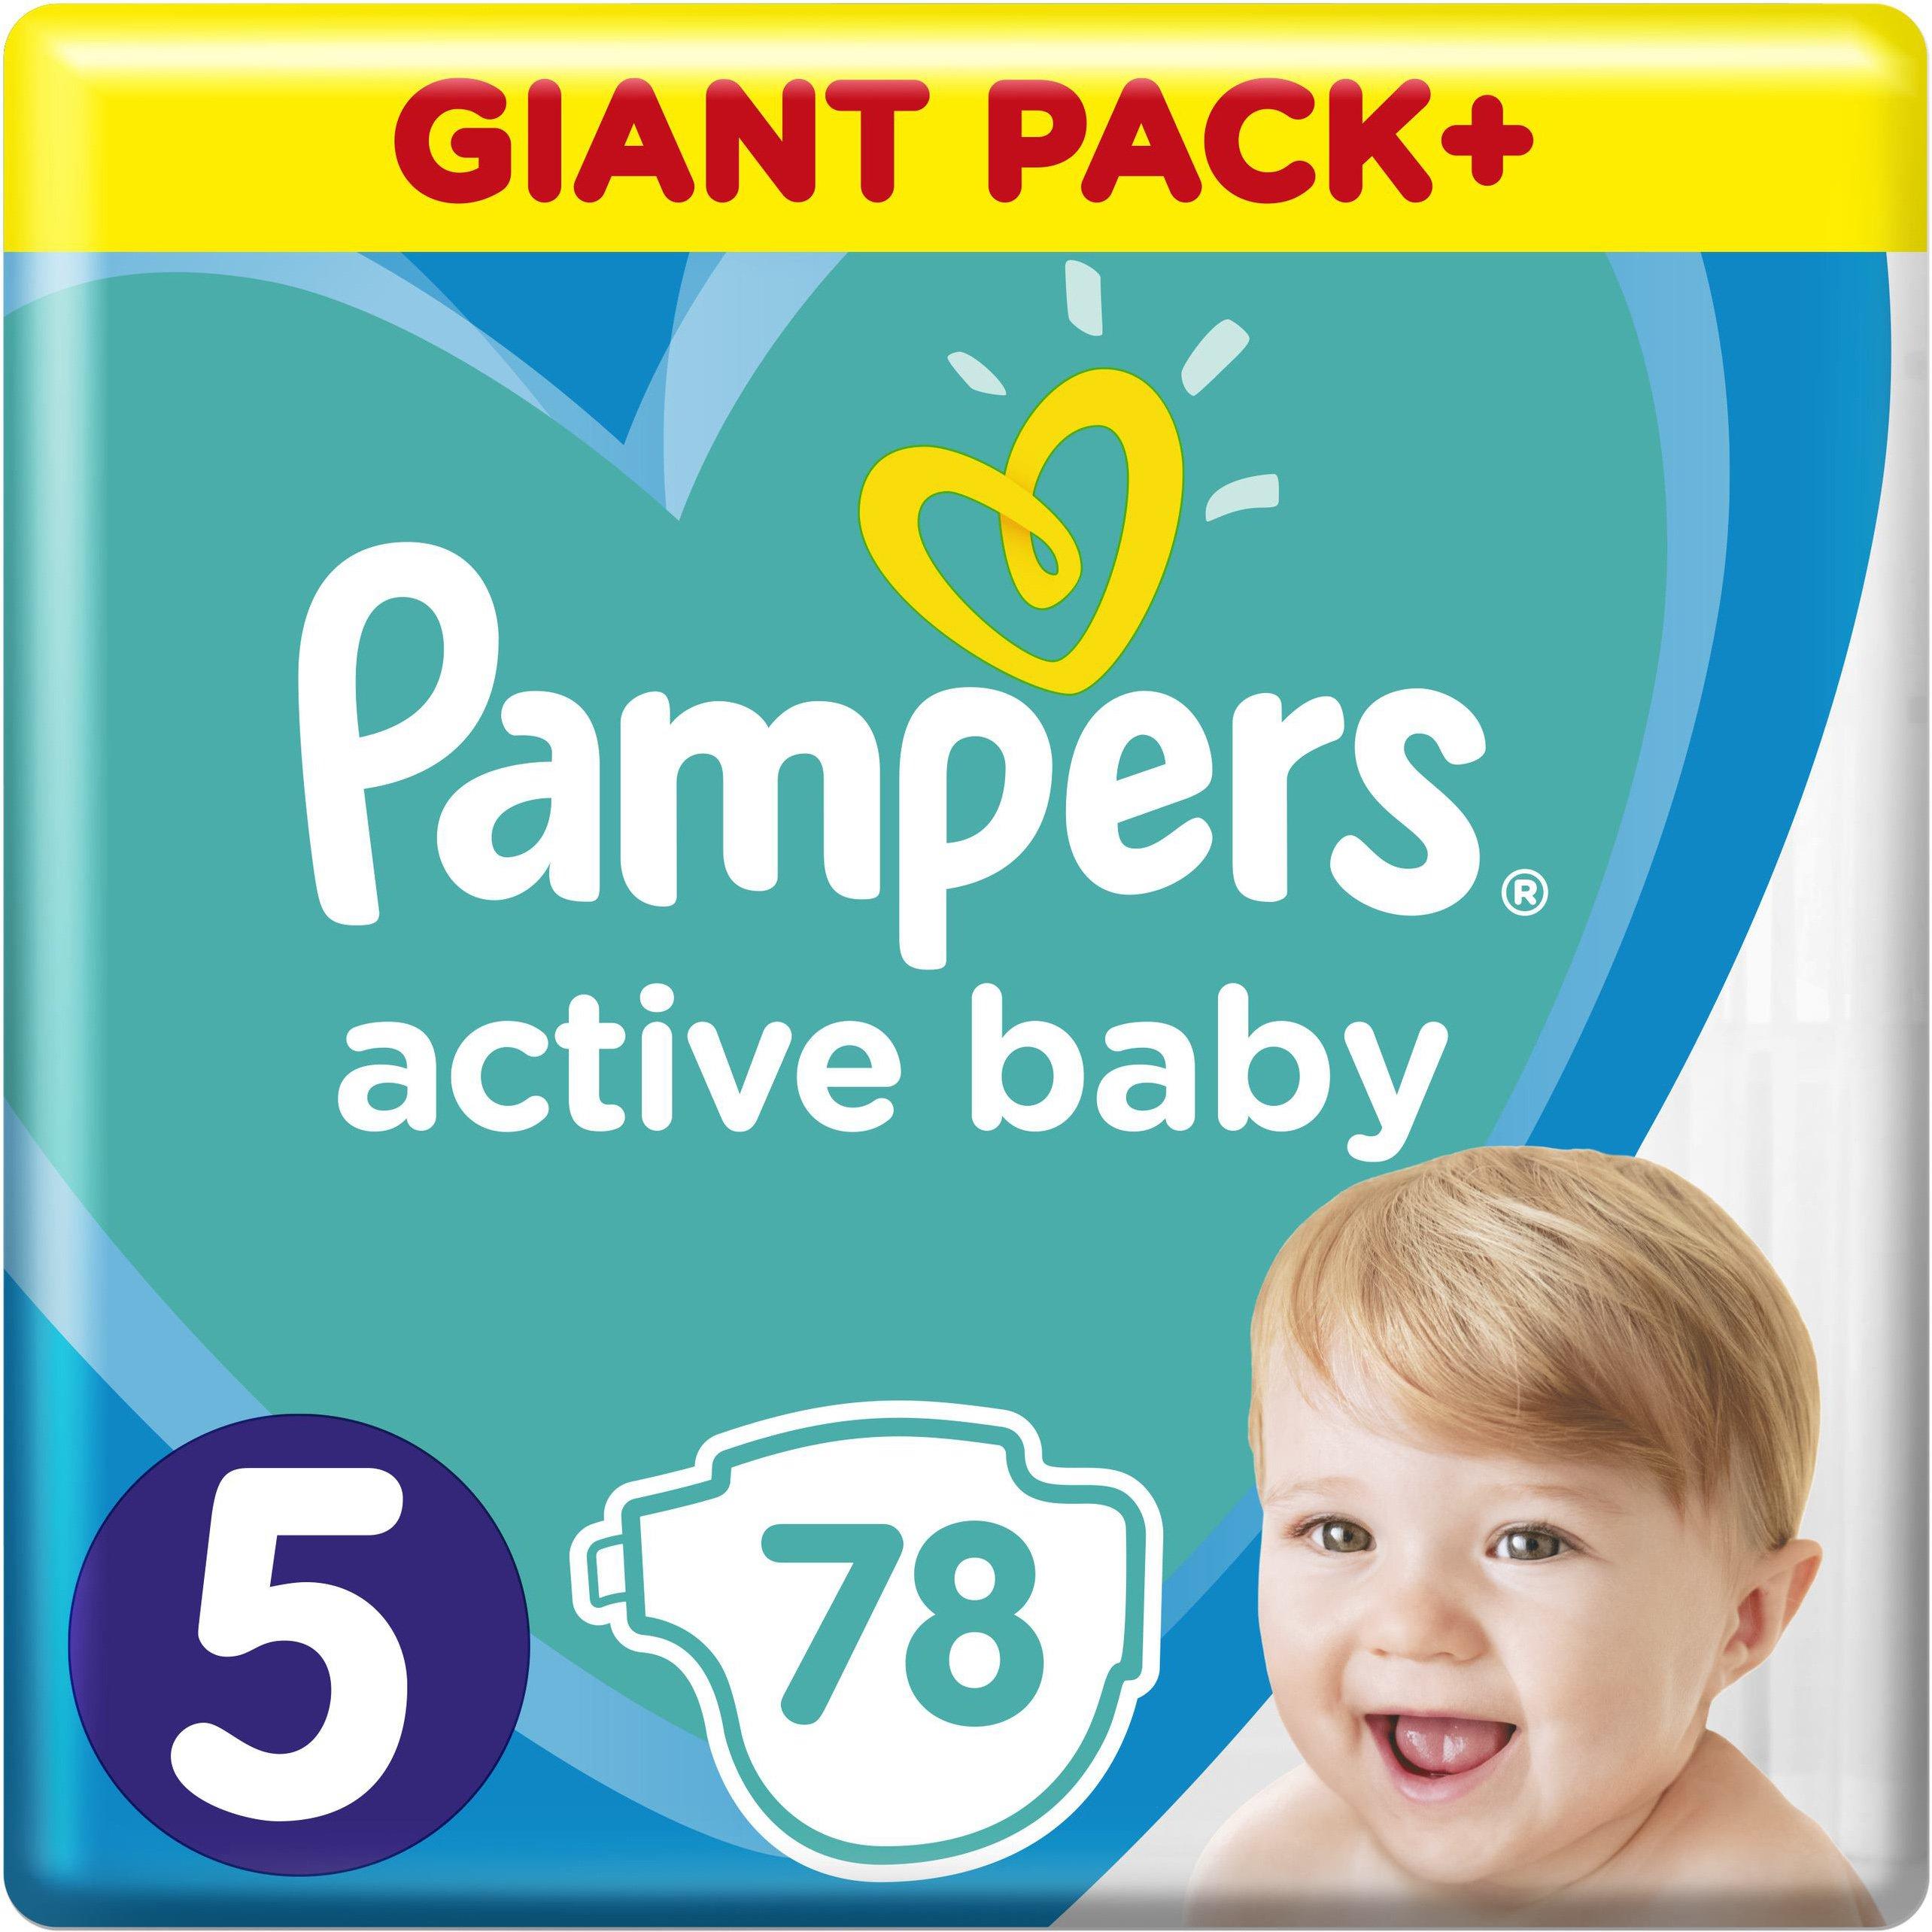 Pampers Active Baby Πάνες Giant Pack No5 (11-16 kg), 78 Πάνες μητέρα παιδί   περιποίηση για το μωρό   πάνες για το μωρό